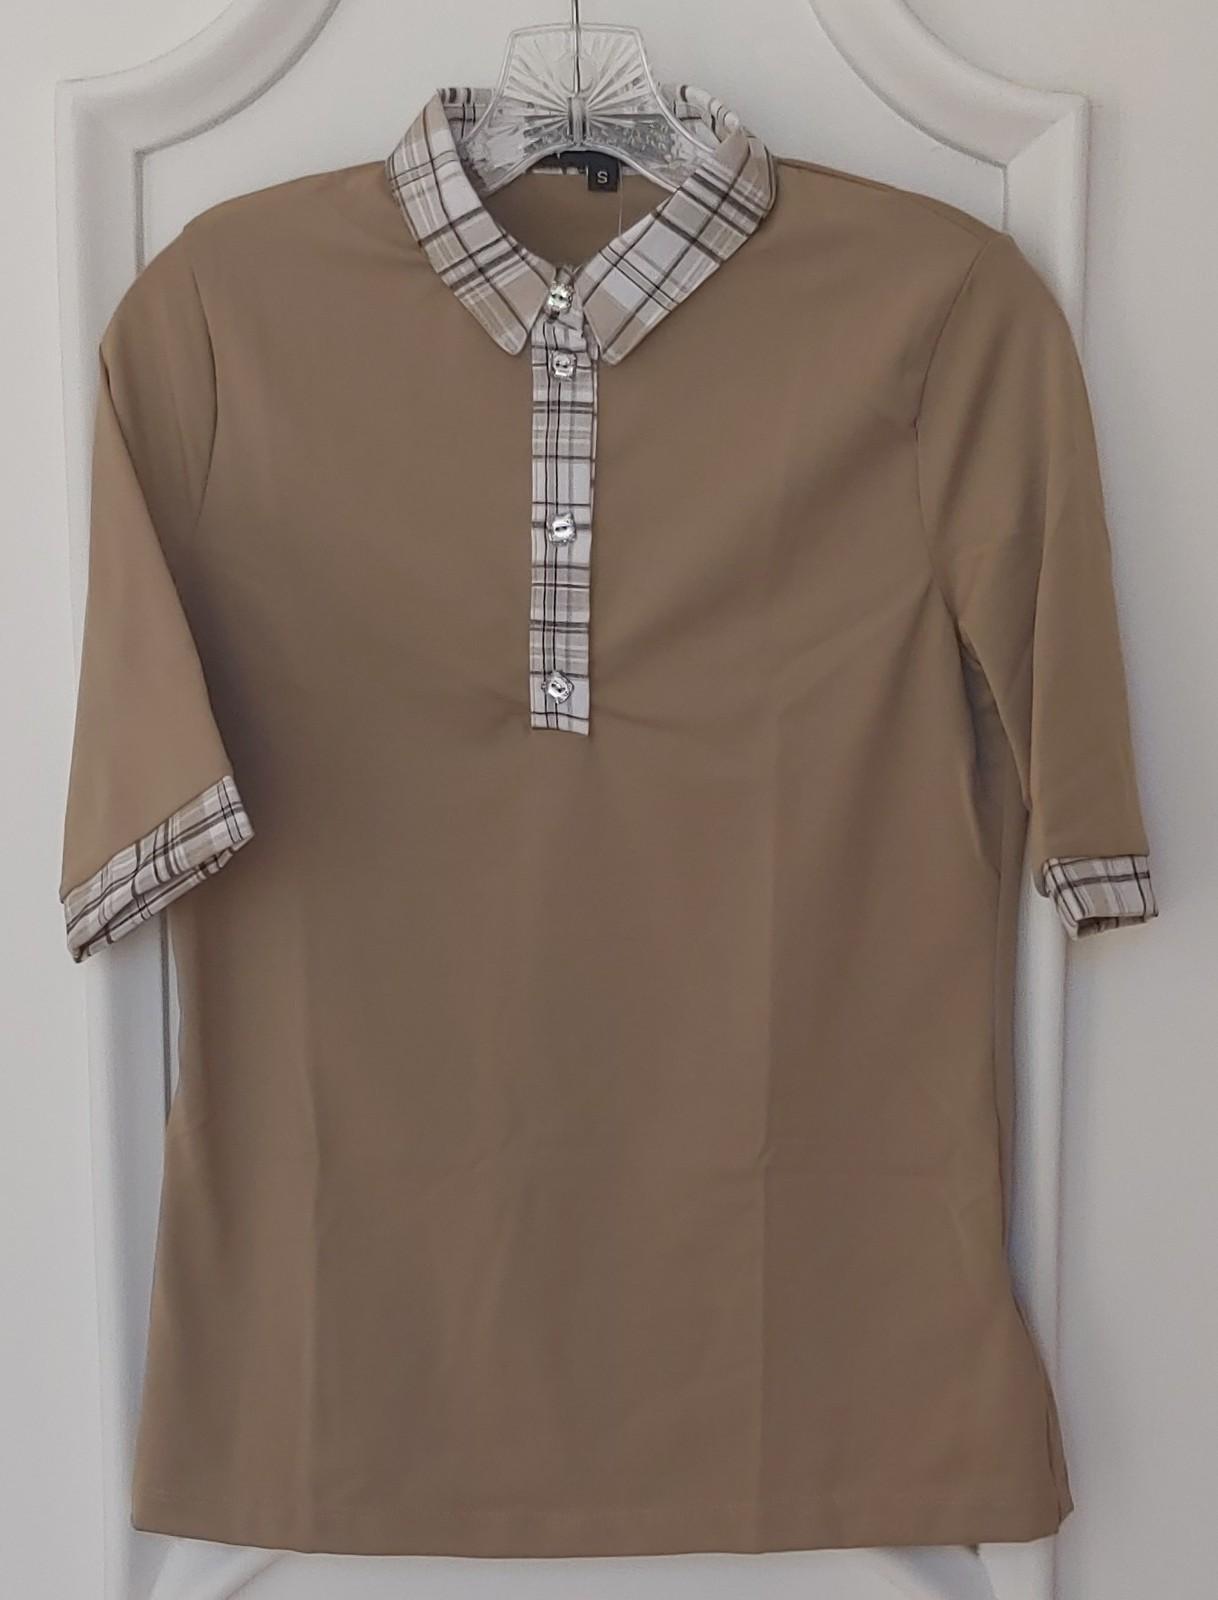 Stylish Women's Golf & Casual Tan Short Sleeve Collar Top, Swarovski Buttons